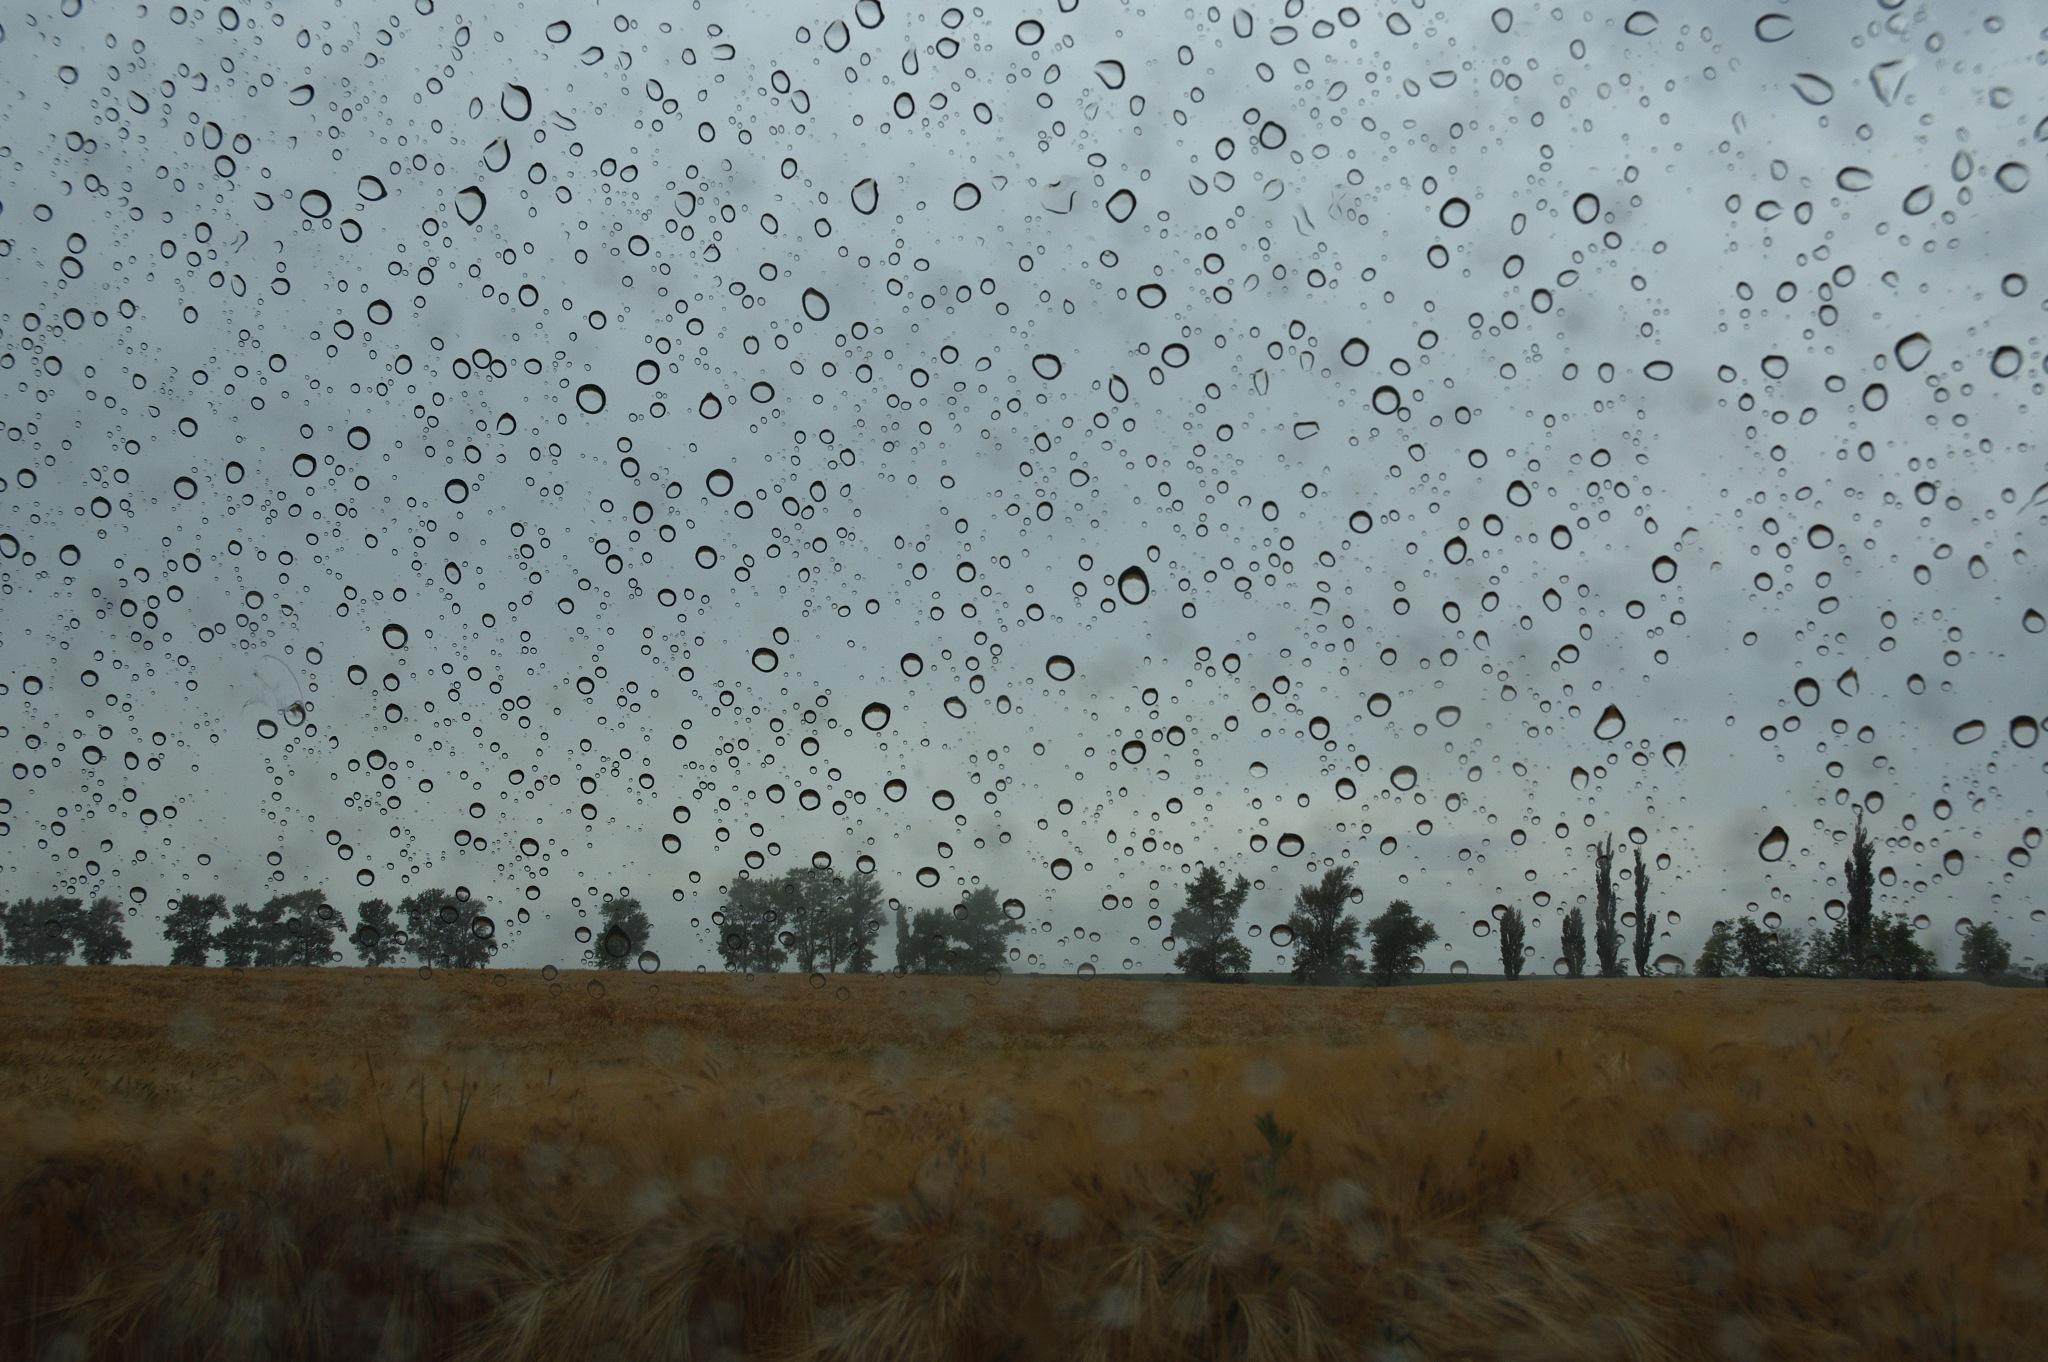 Rain by Kovacs Krisztian